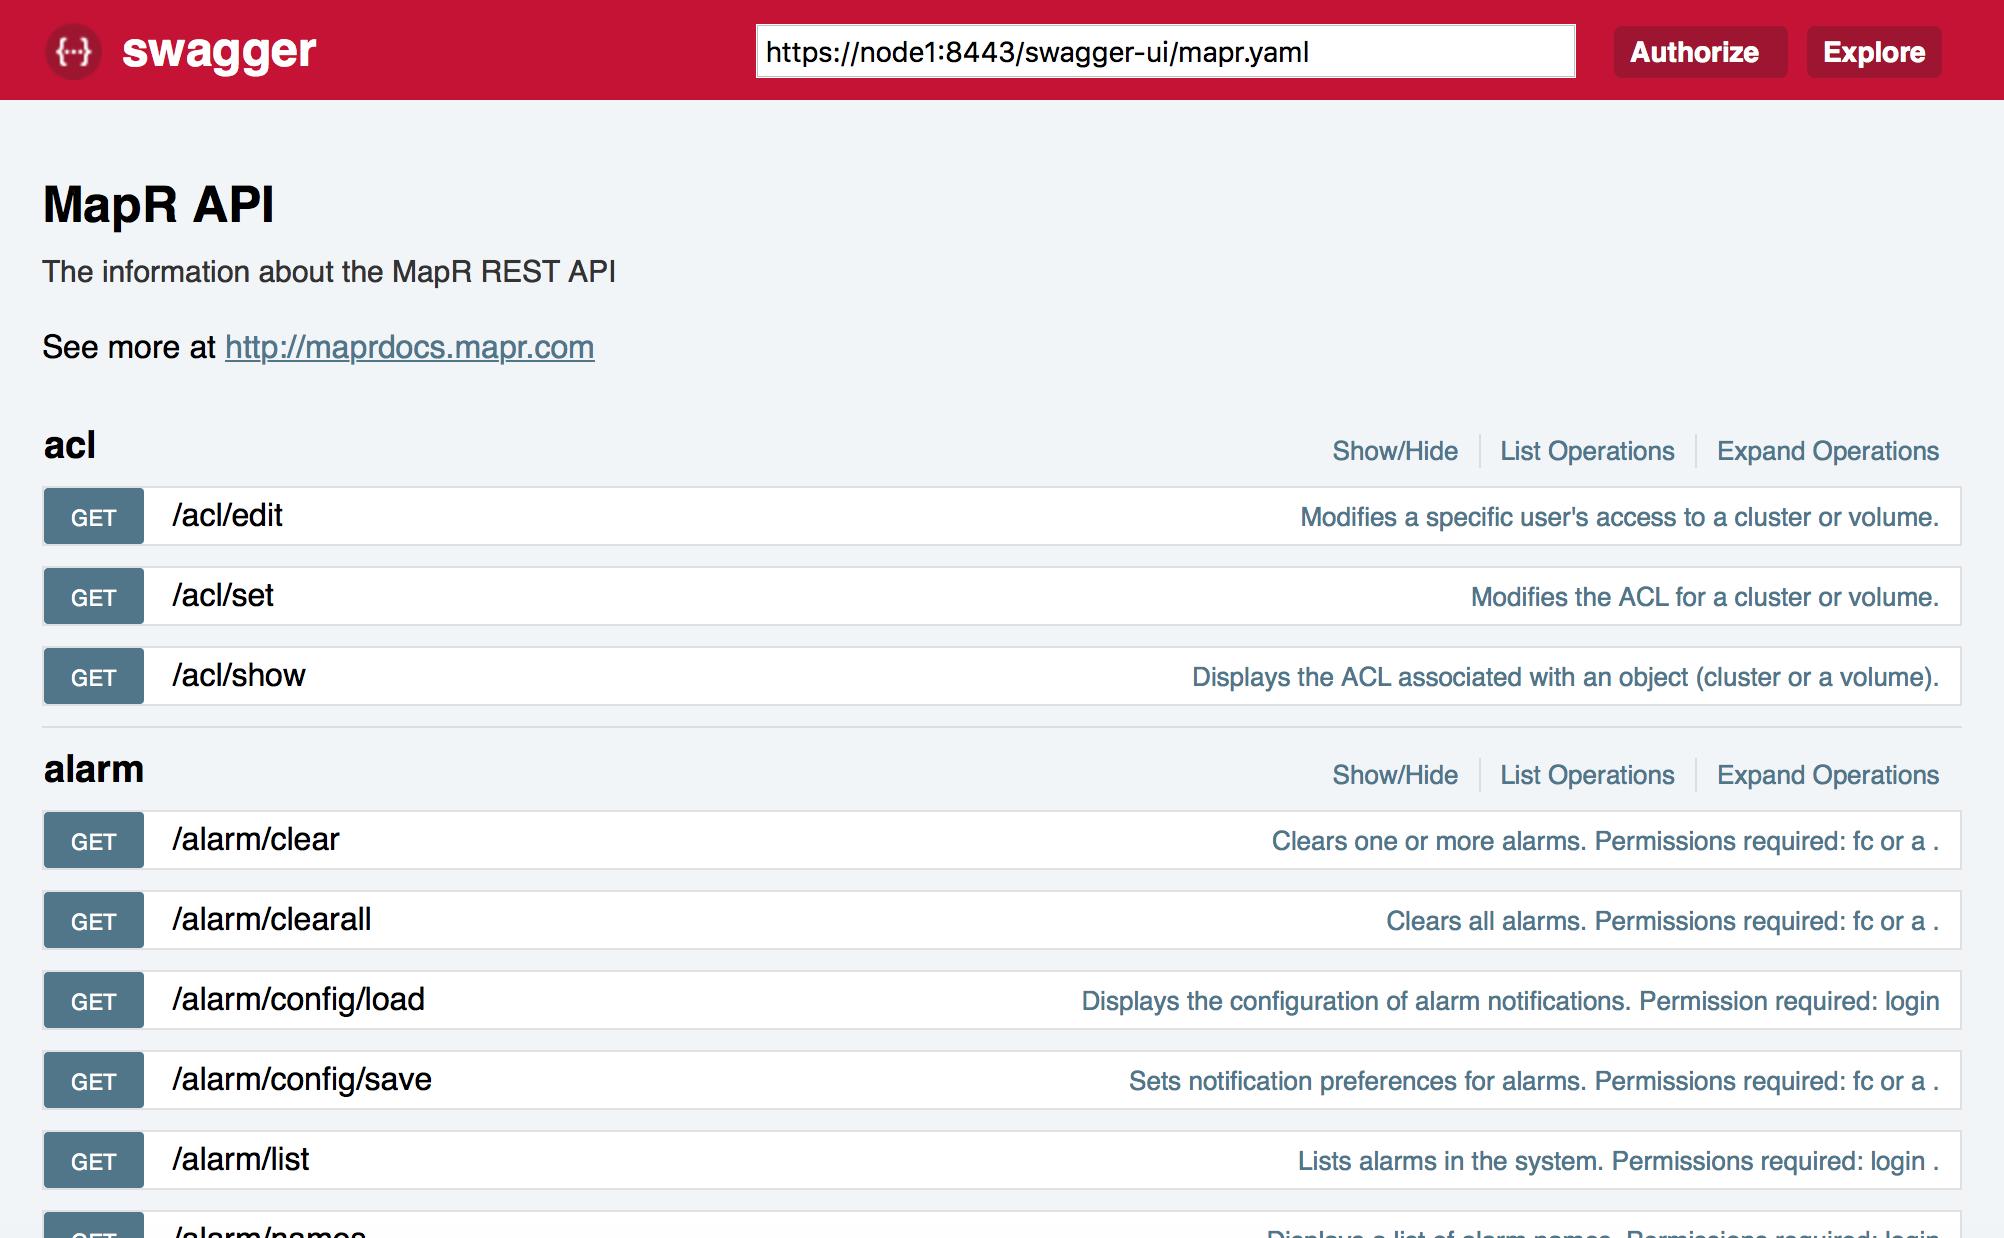 Home · nagix/mapr-swagger-ui Wiki · GitHub